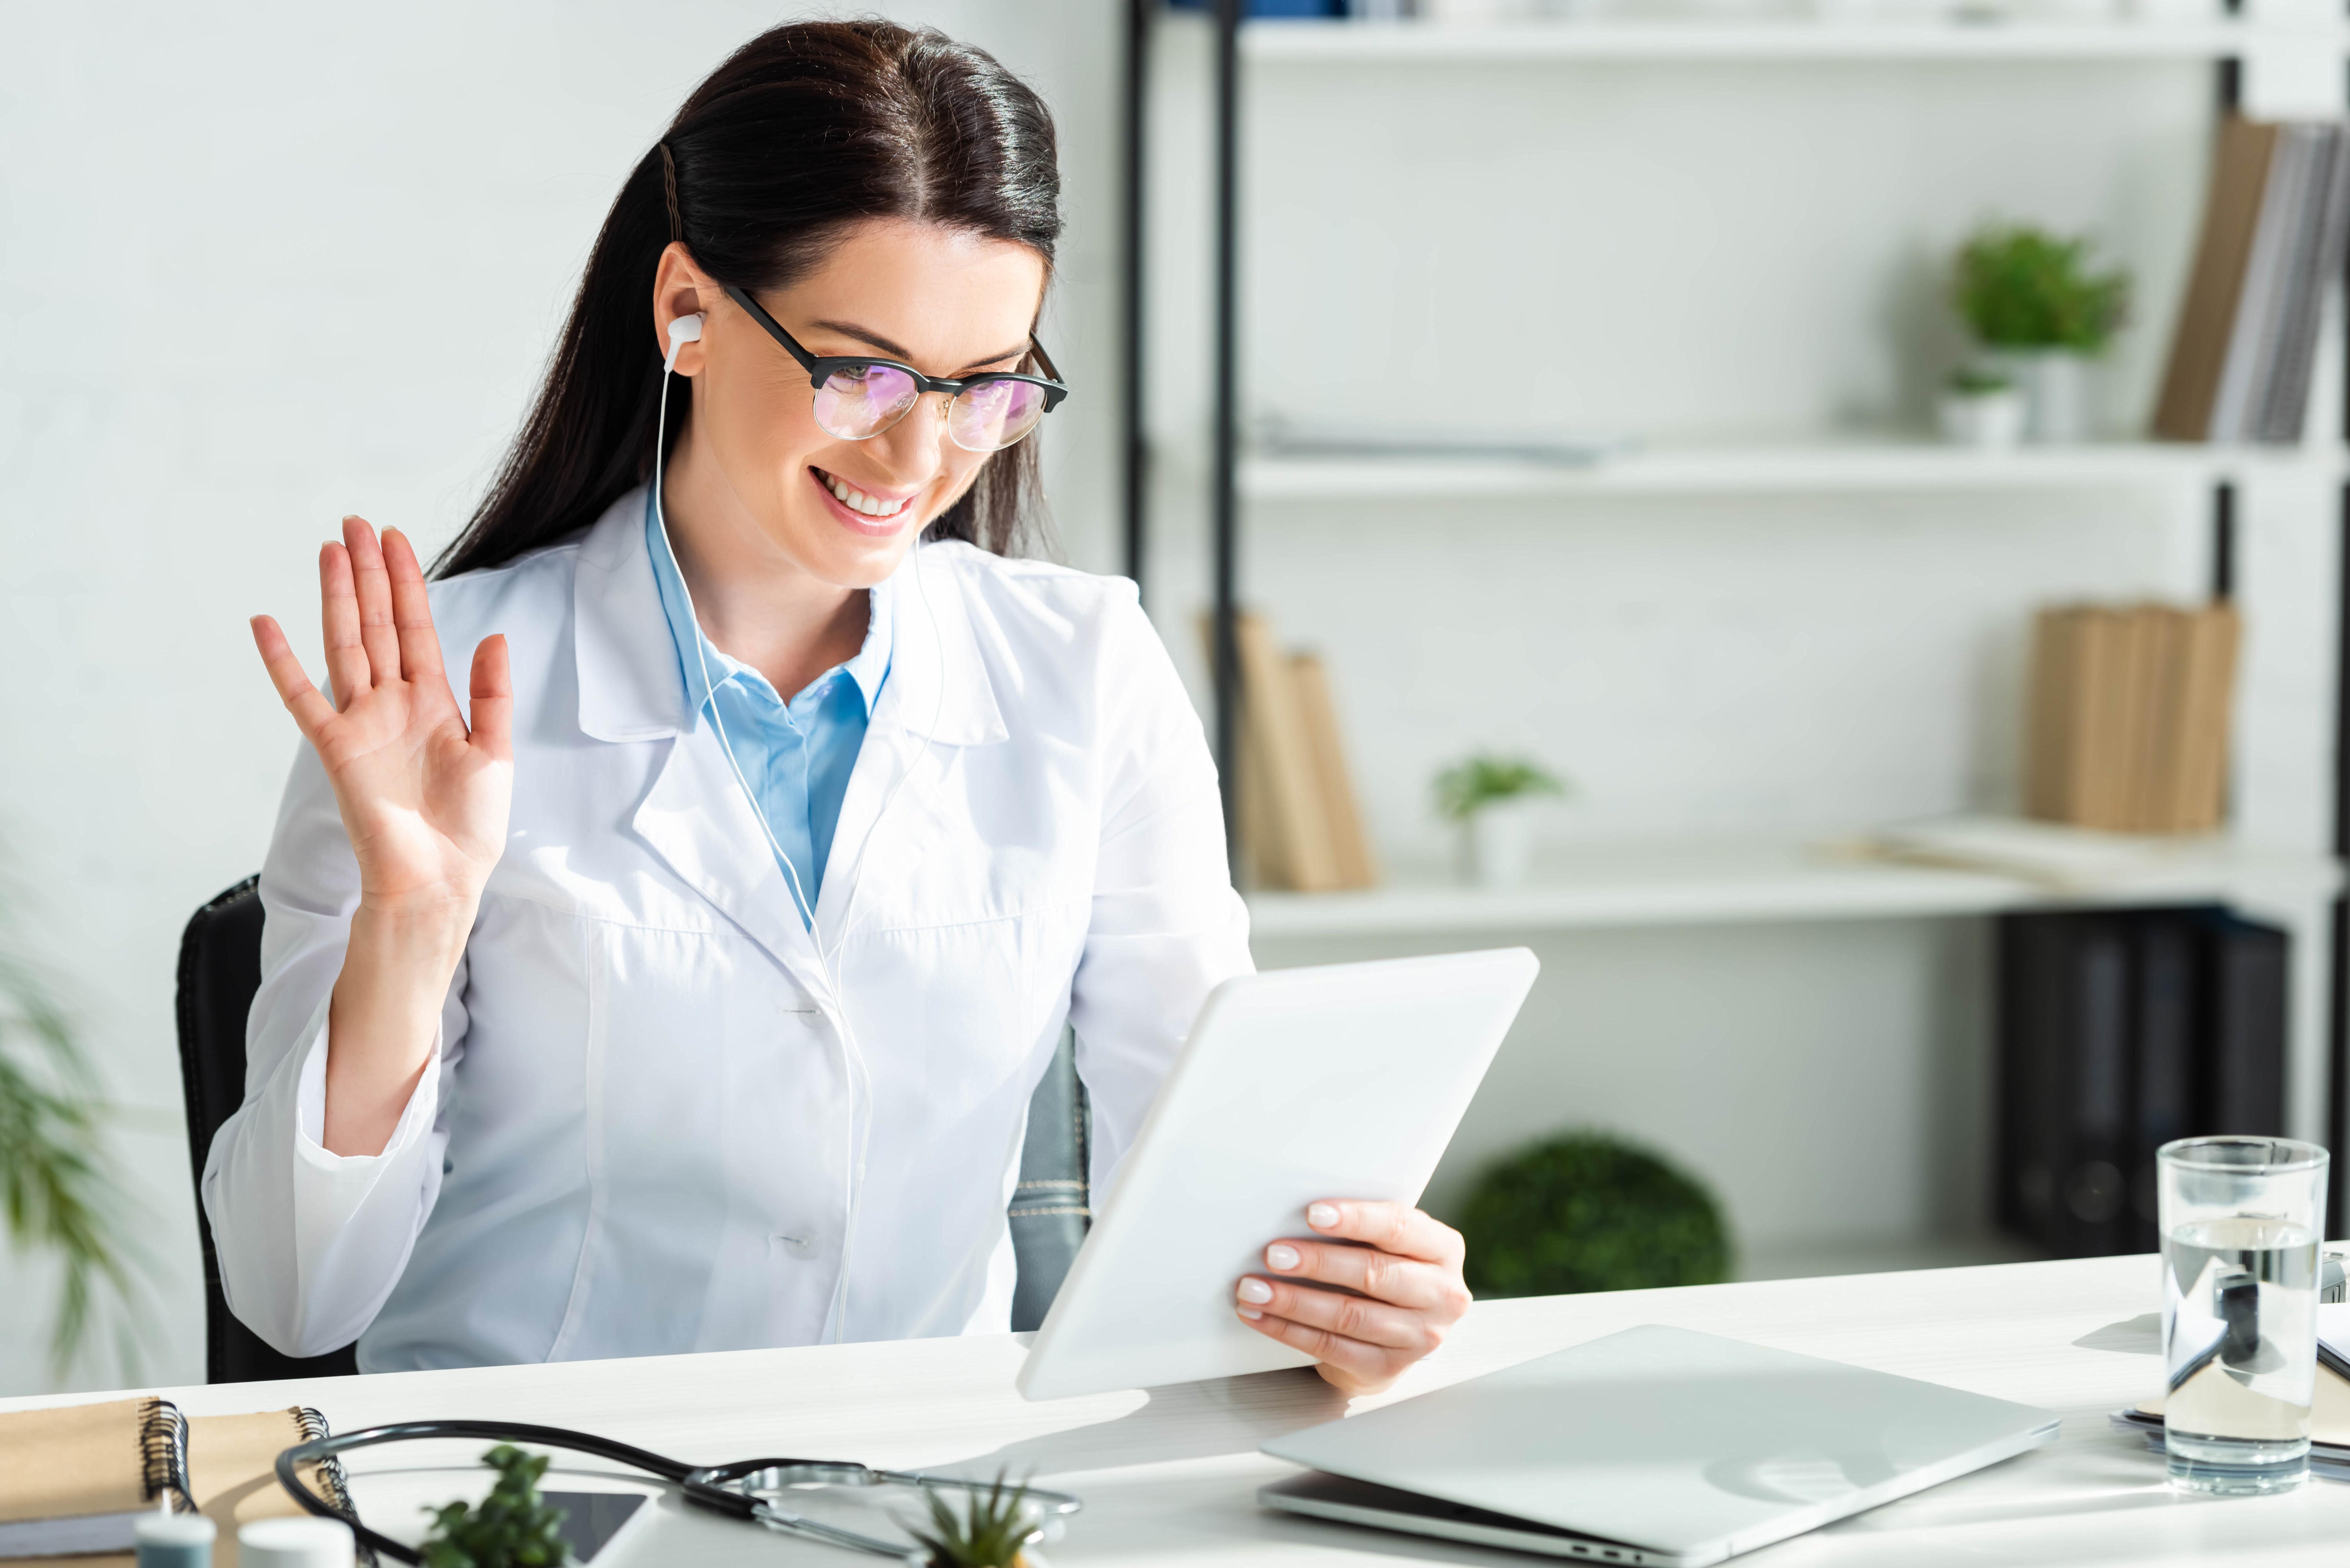 teleconsulta para médicos